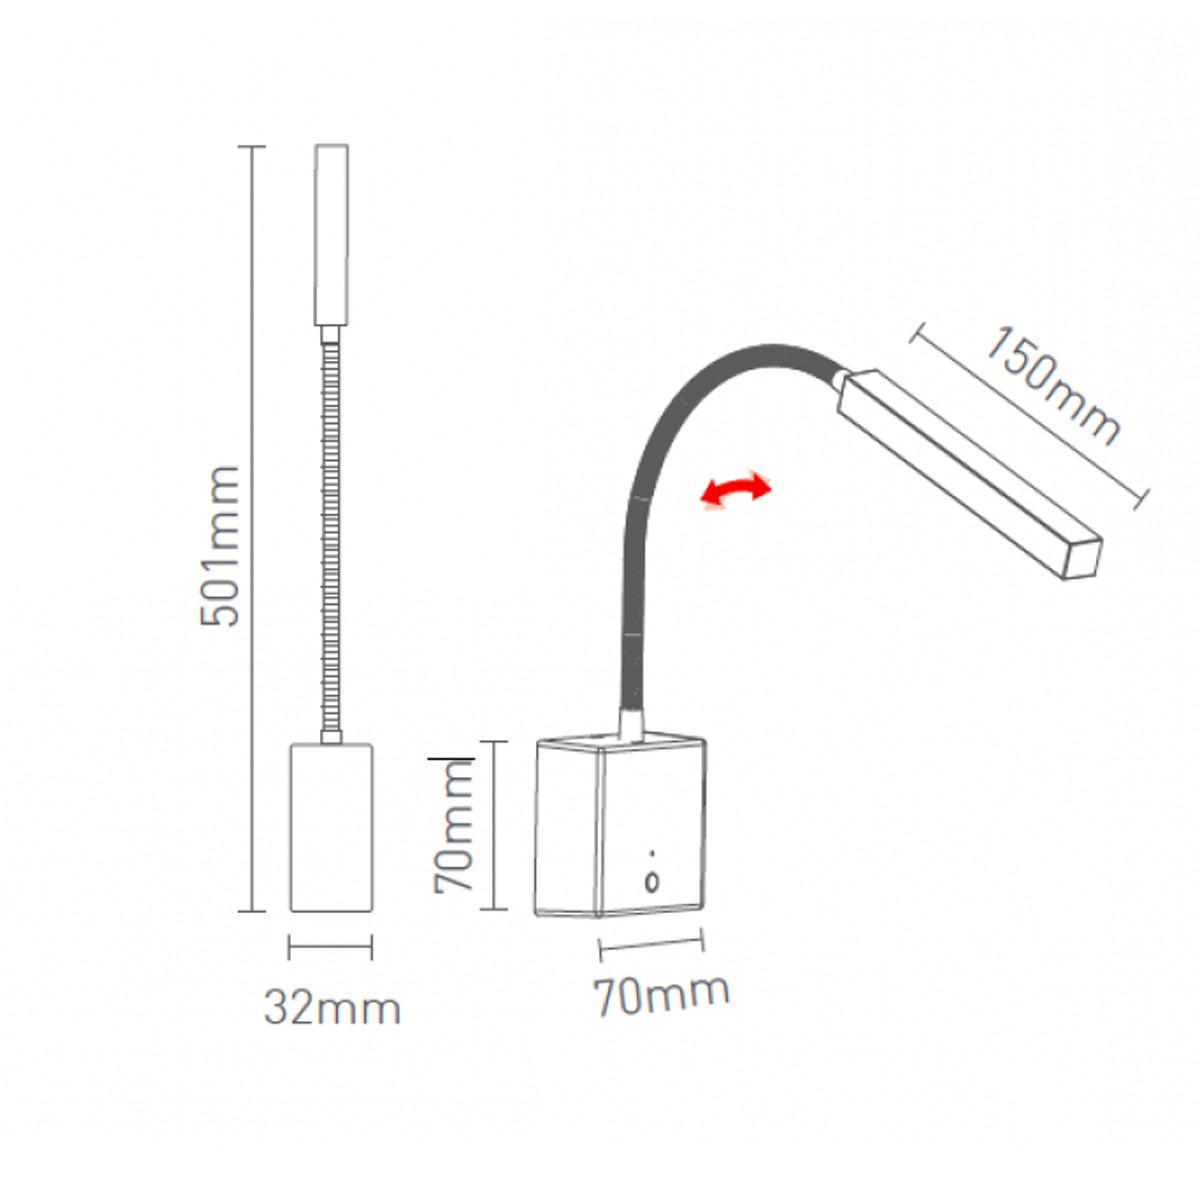 Arandela Snake Cores Dimmer LED com USB e Suporte - Interlight 4146